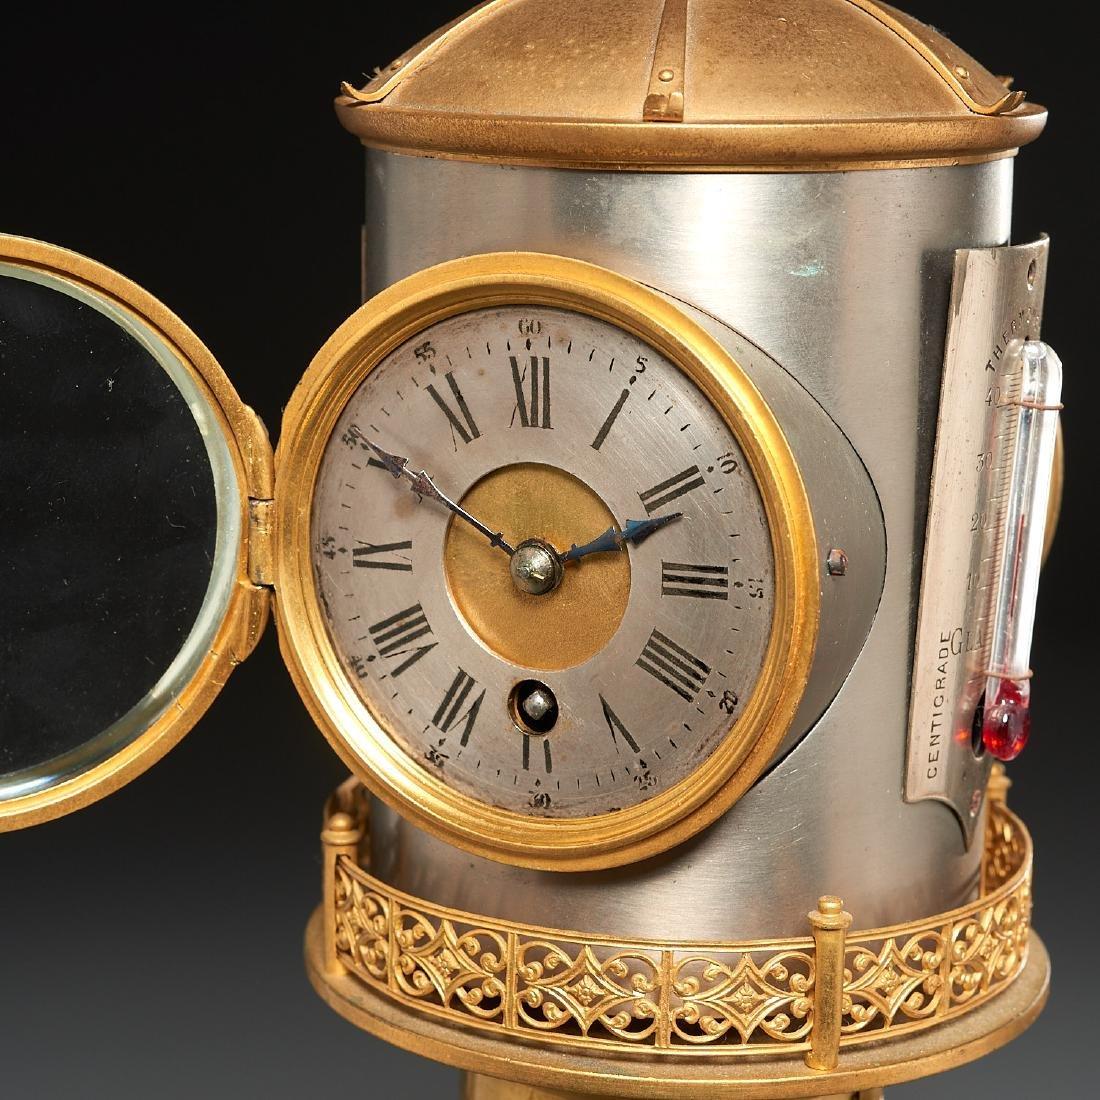 Belle Epoque automaton lighthouse clock barometer - 3